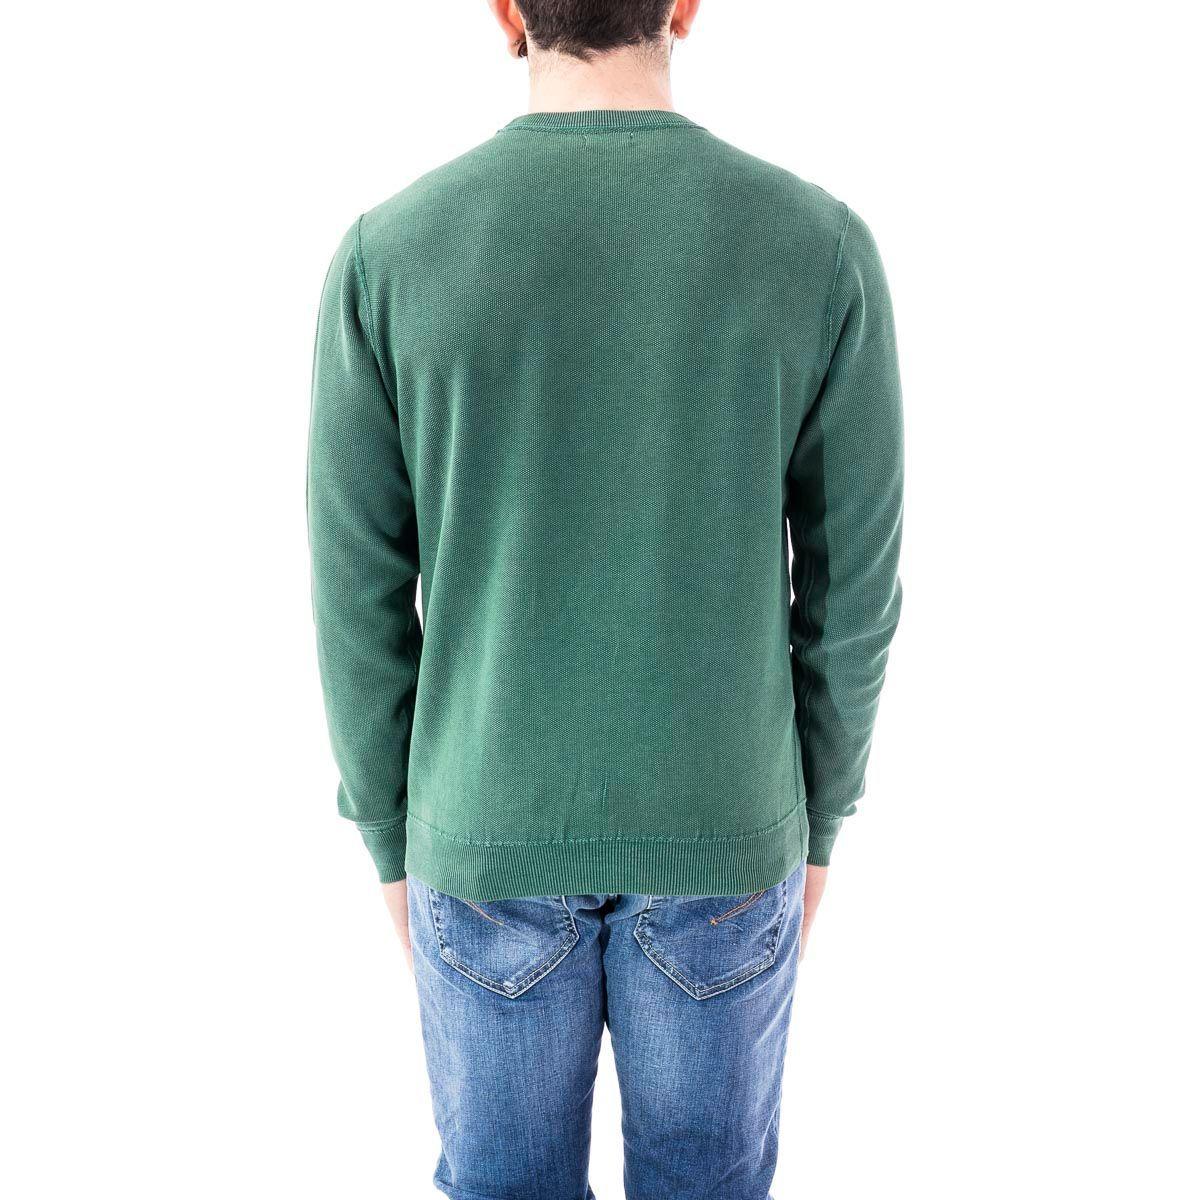 SUN 68 MEN'S K3010988 GREEN COTTON SWEATER